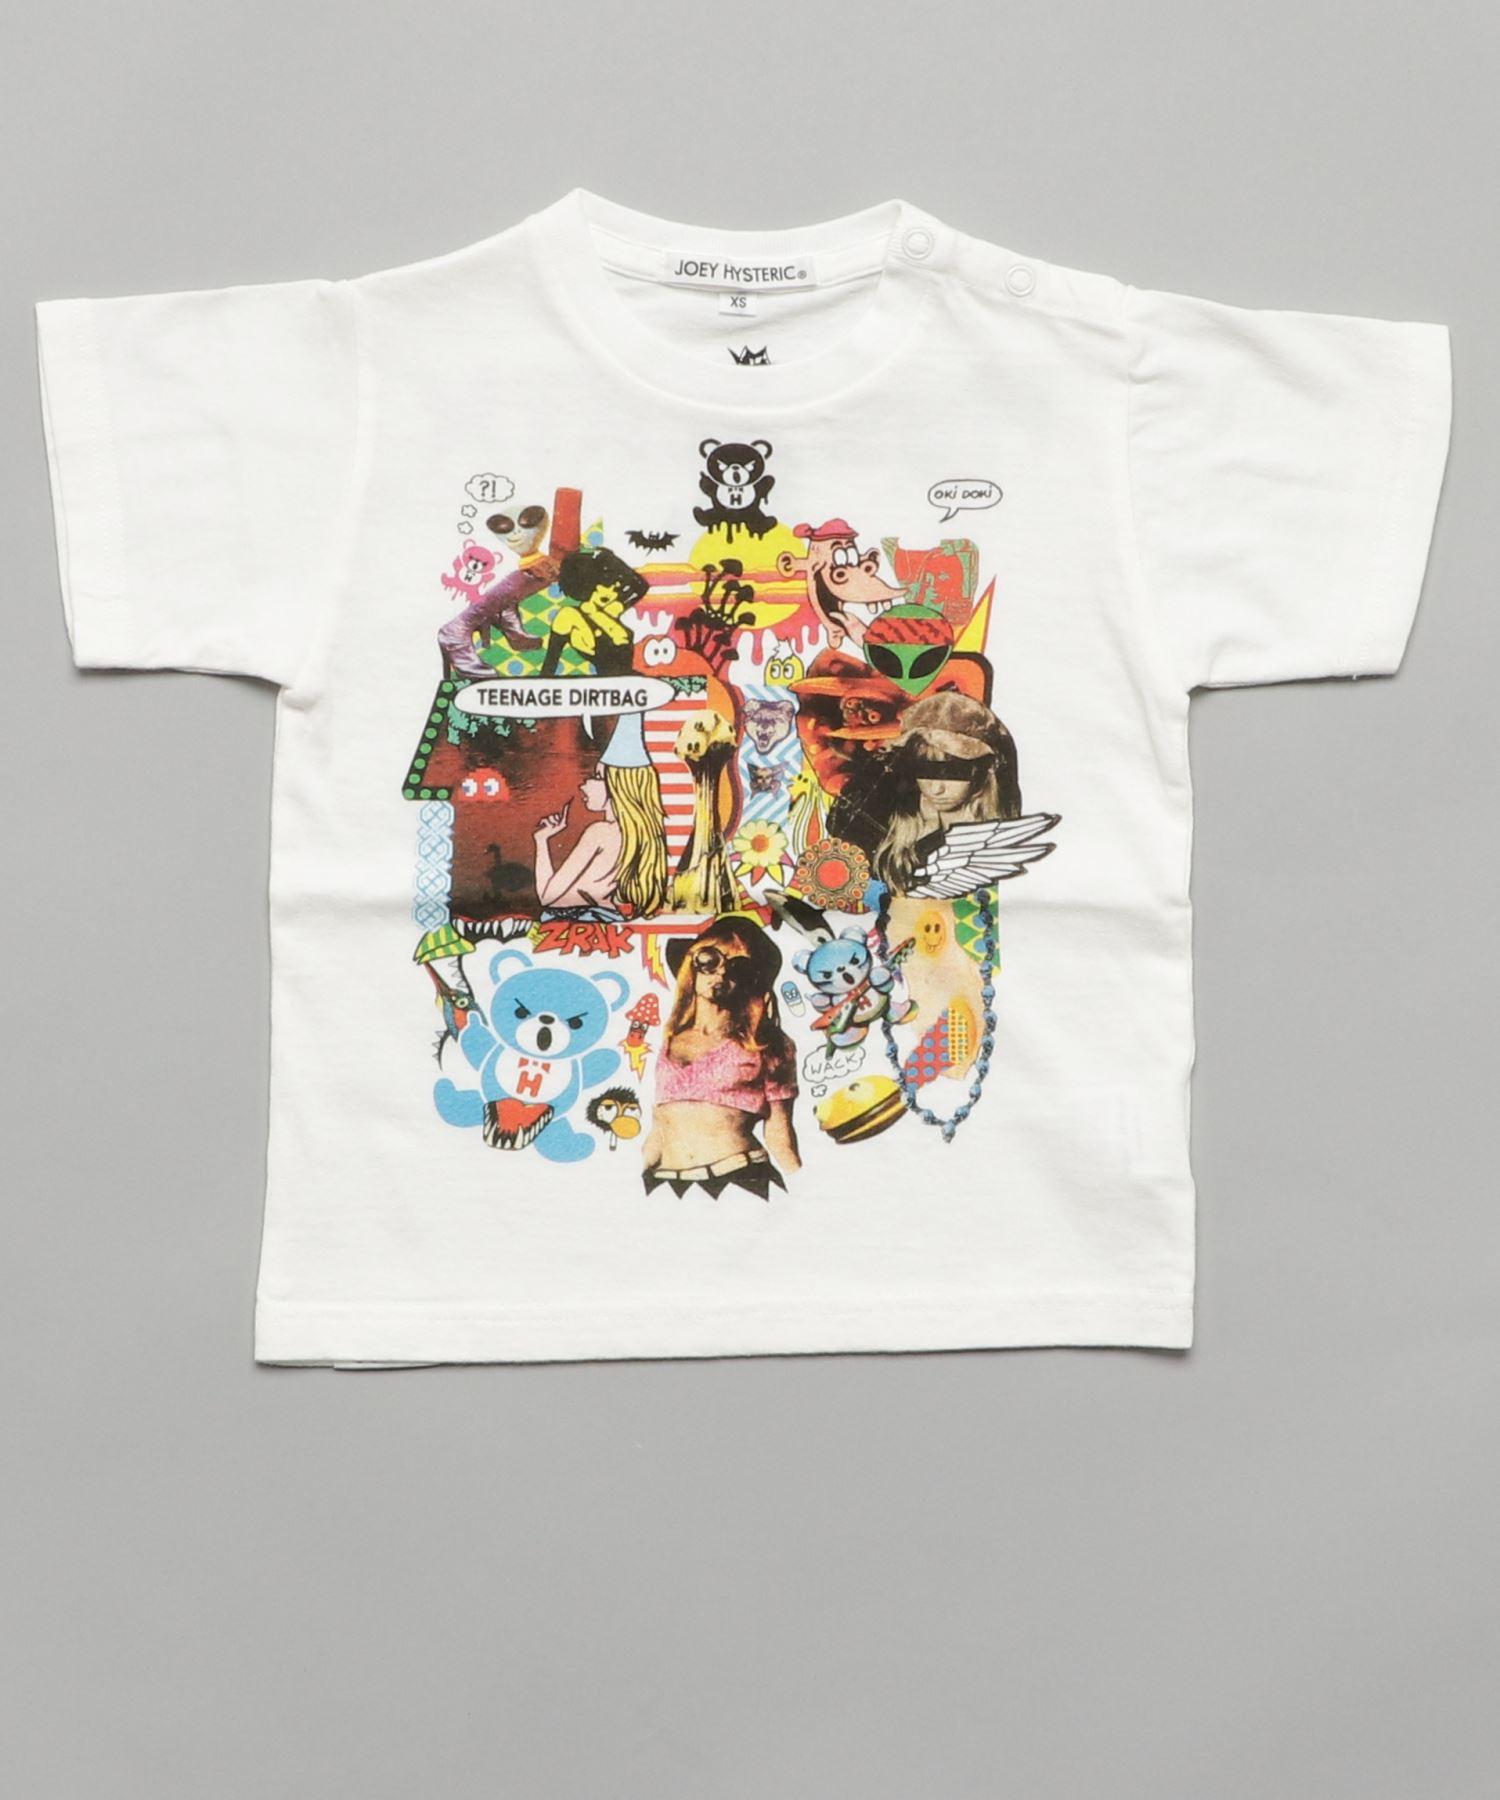 SKLX/TEENAGE DIRTBAG pt Tシャツ【XS/S/M】